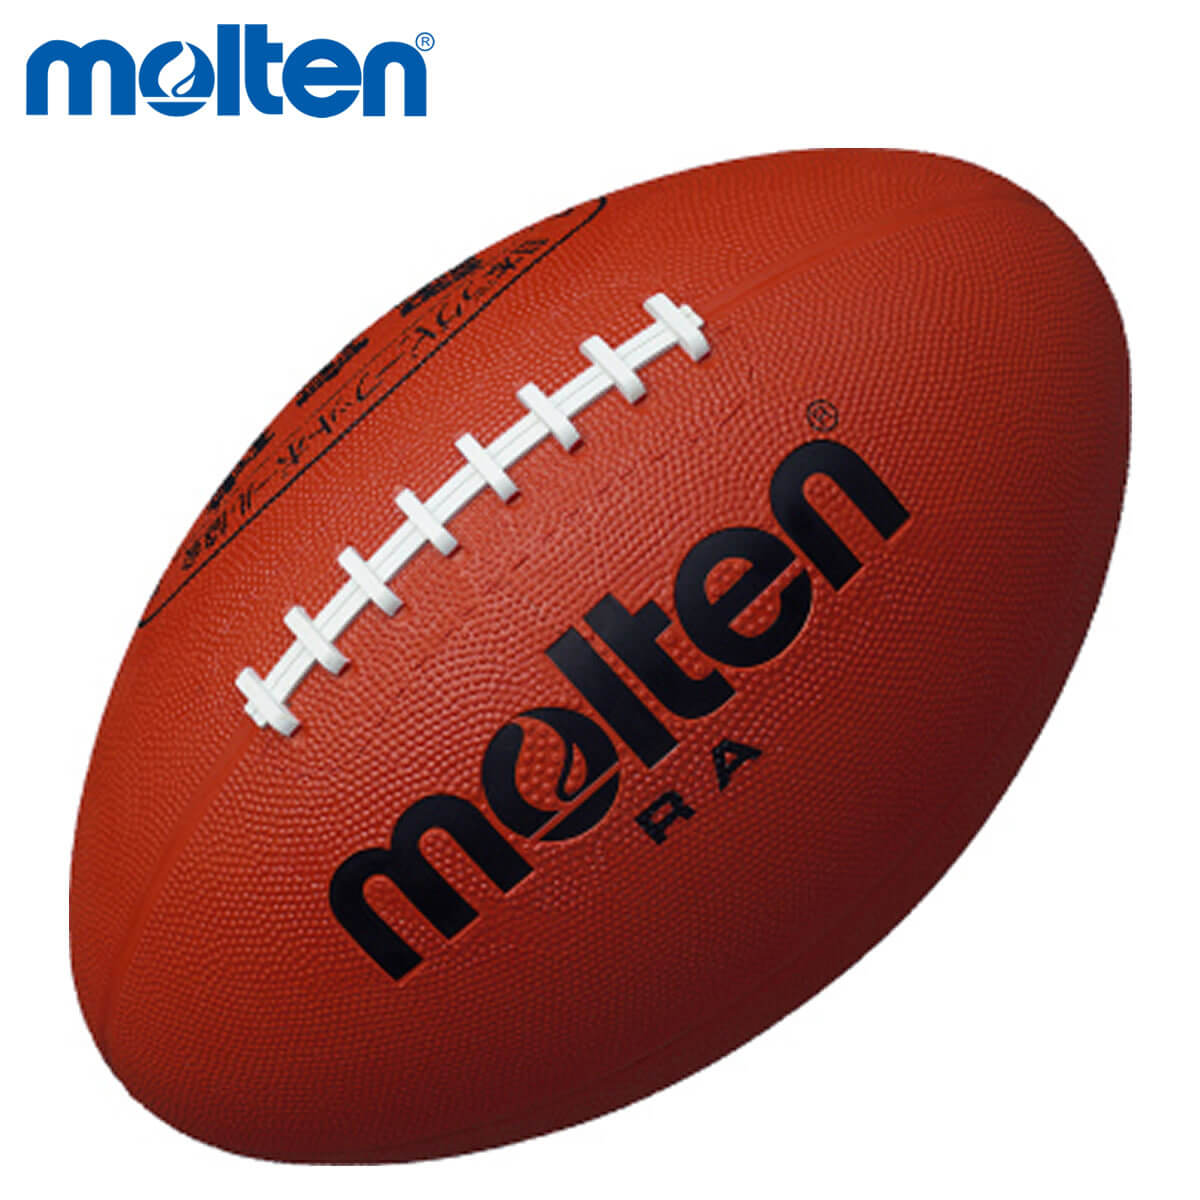 molten RA ラグビー ☆国内最安値に挑戦☆ ボール ラグビーボール 2021 取り寄せ モルテン 記念日